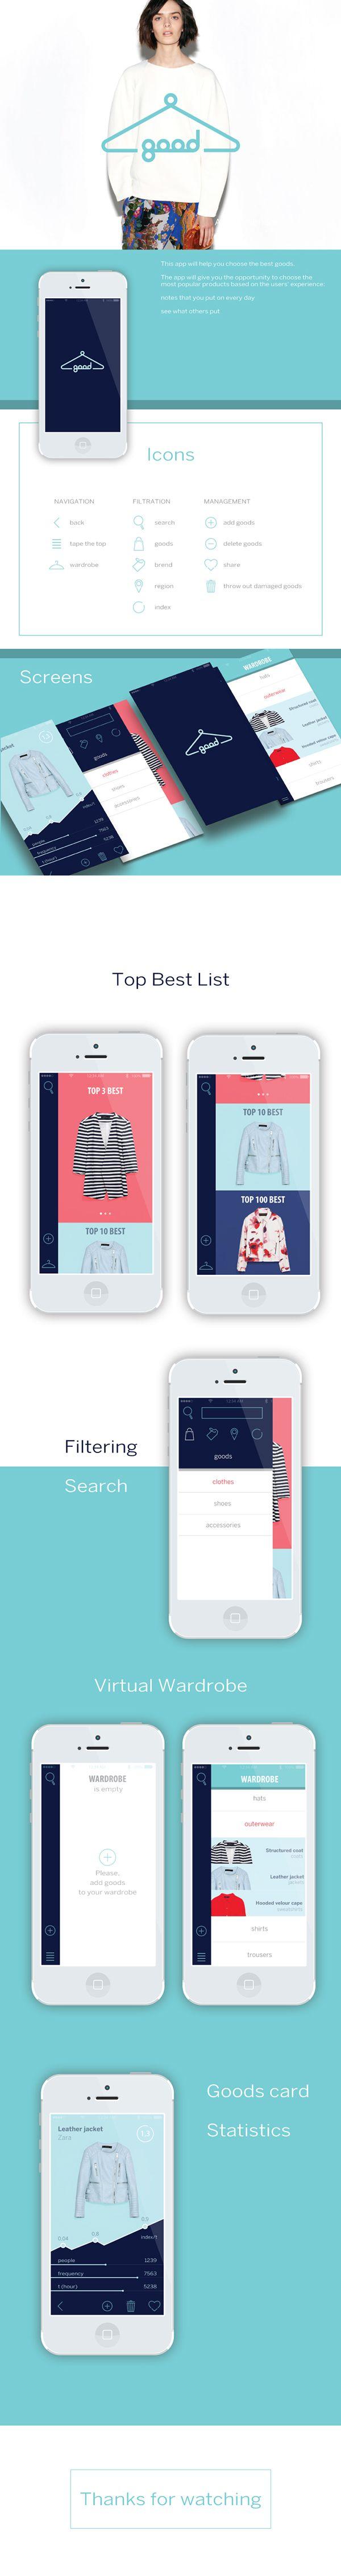 good - app design